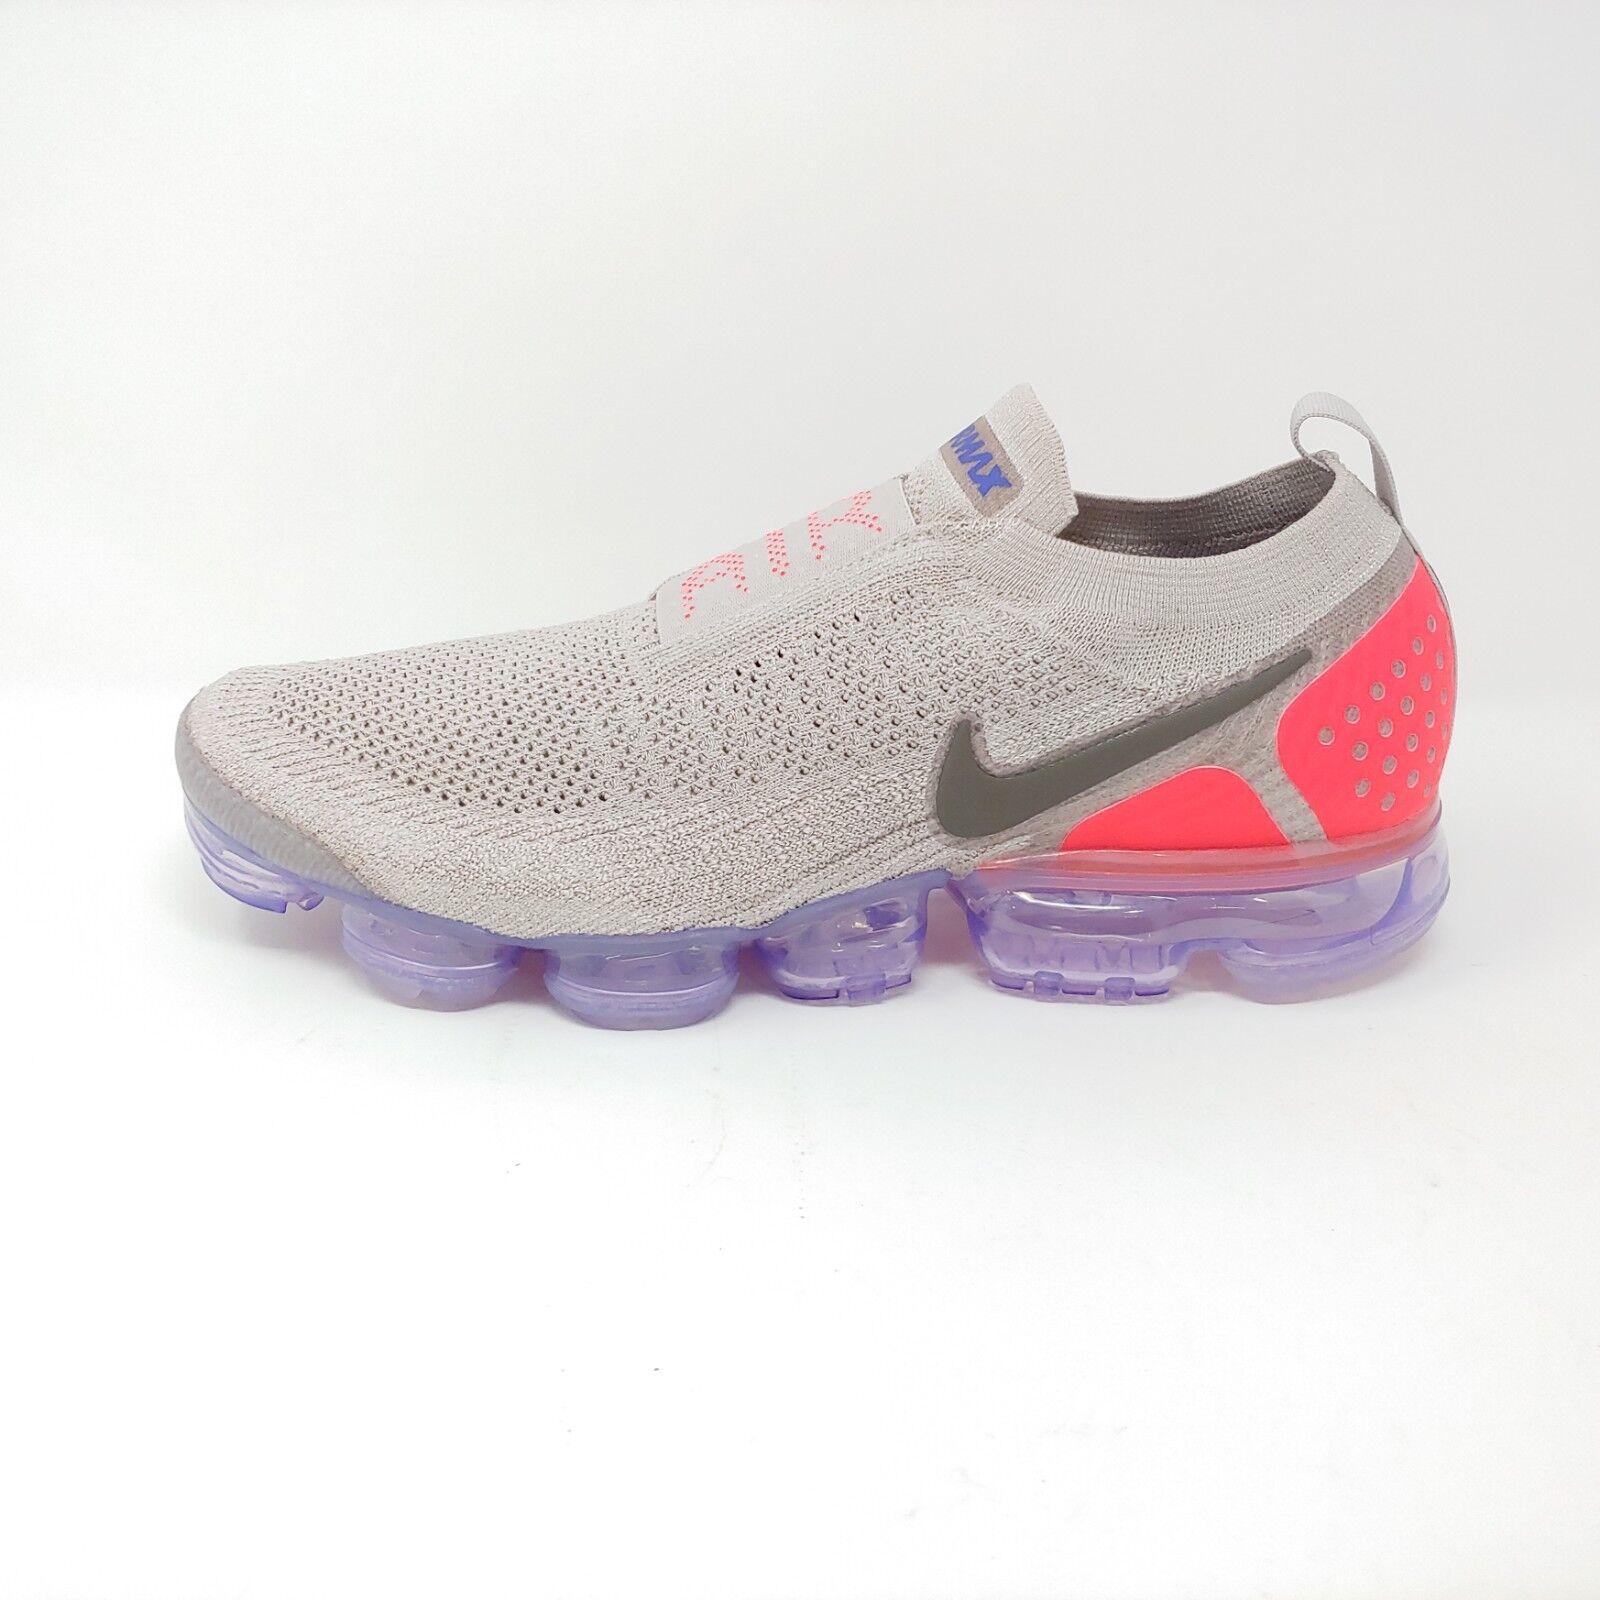 Nike air vapormax flyknit moc 2 mond teilchen solar rote sneaker fk männer größe 12,5